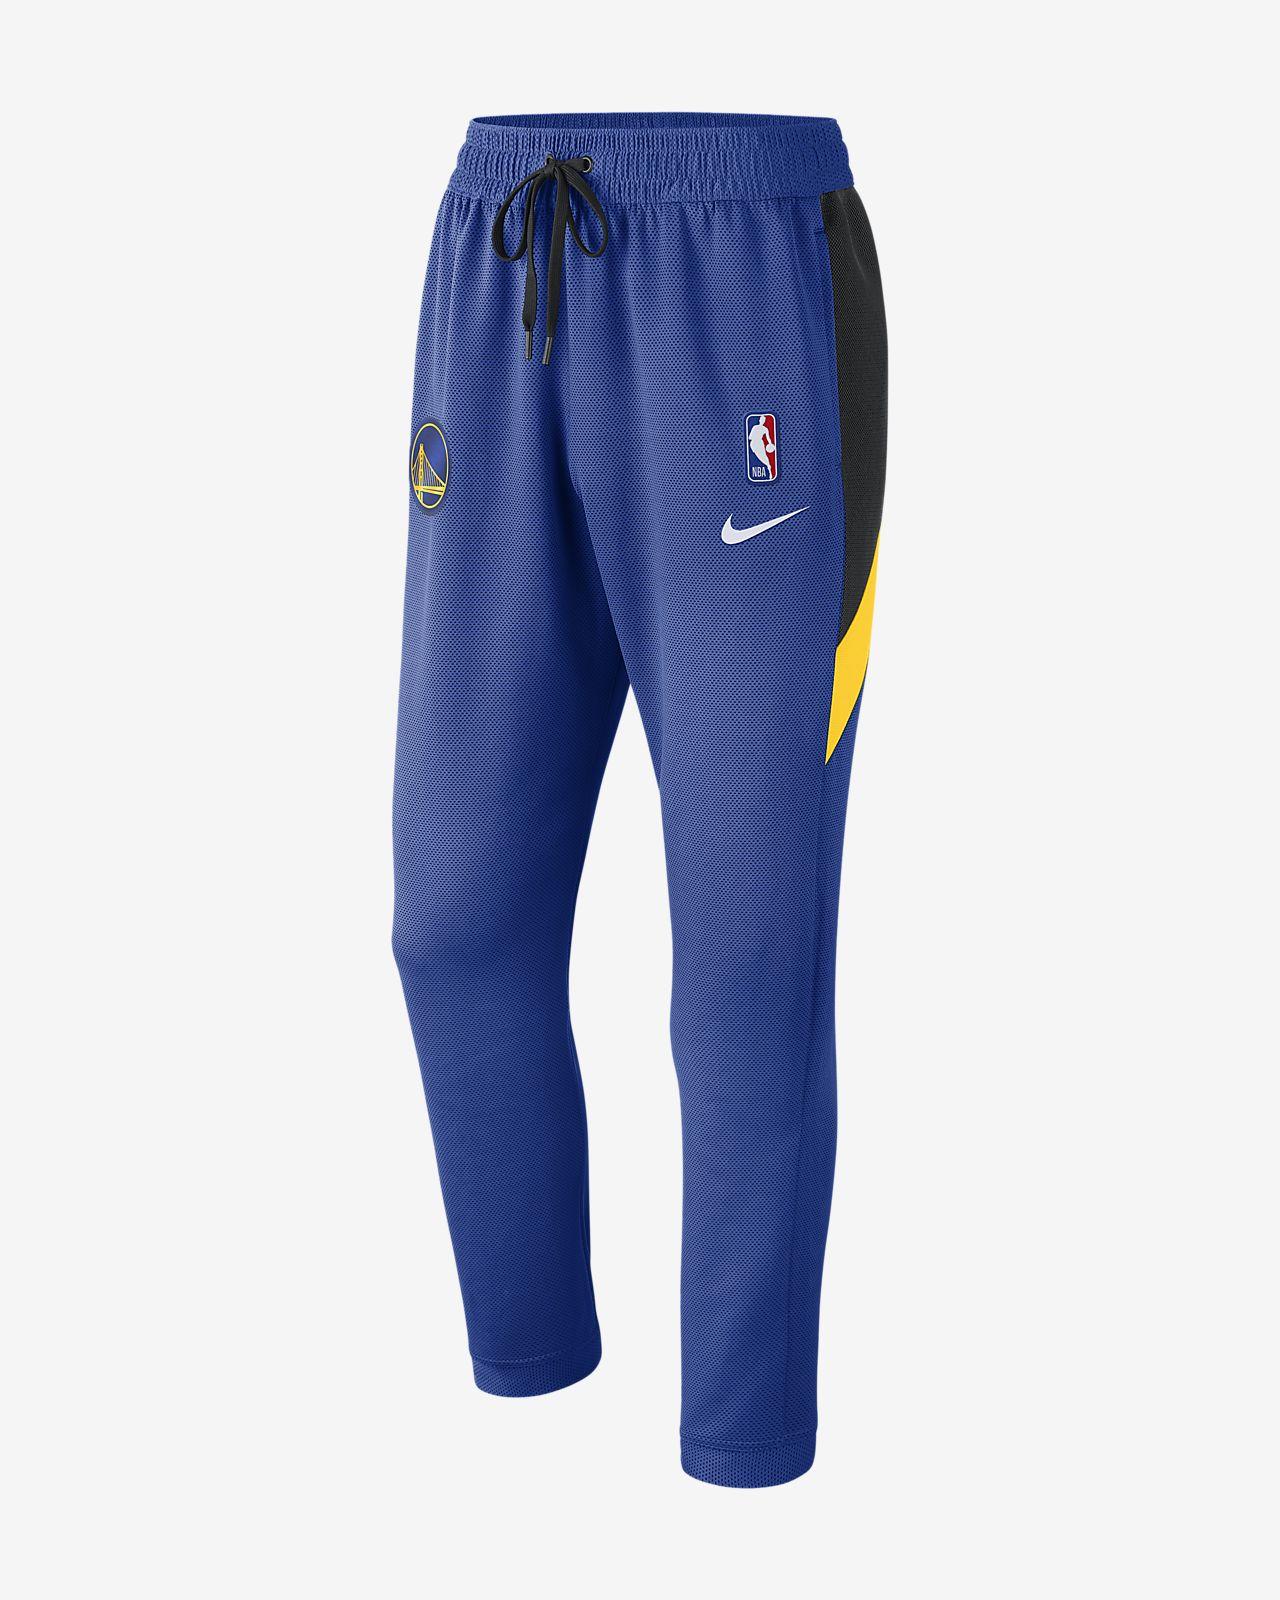 Golden State Warriors Nike Therma Flex Showtime NBA-Herrenhose